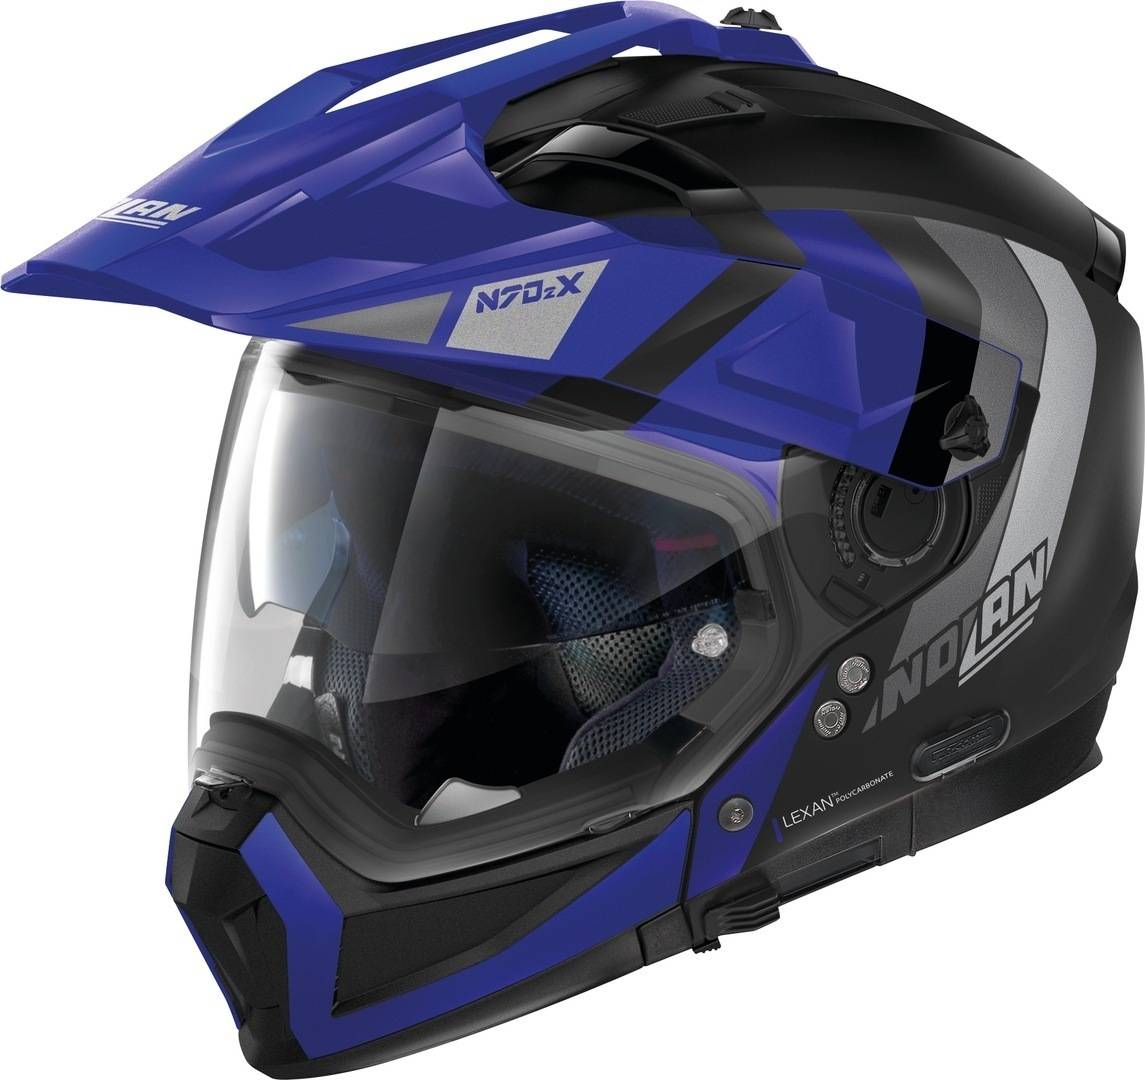 Nolan N70-2 X Decurio N-Com Helmet  - Black Blue - Size: L